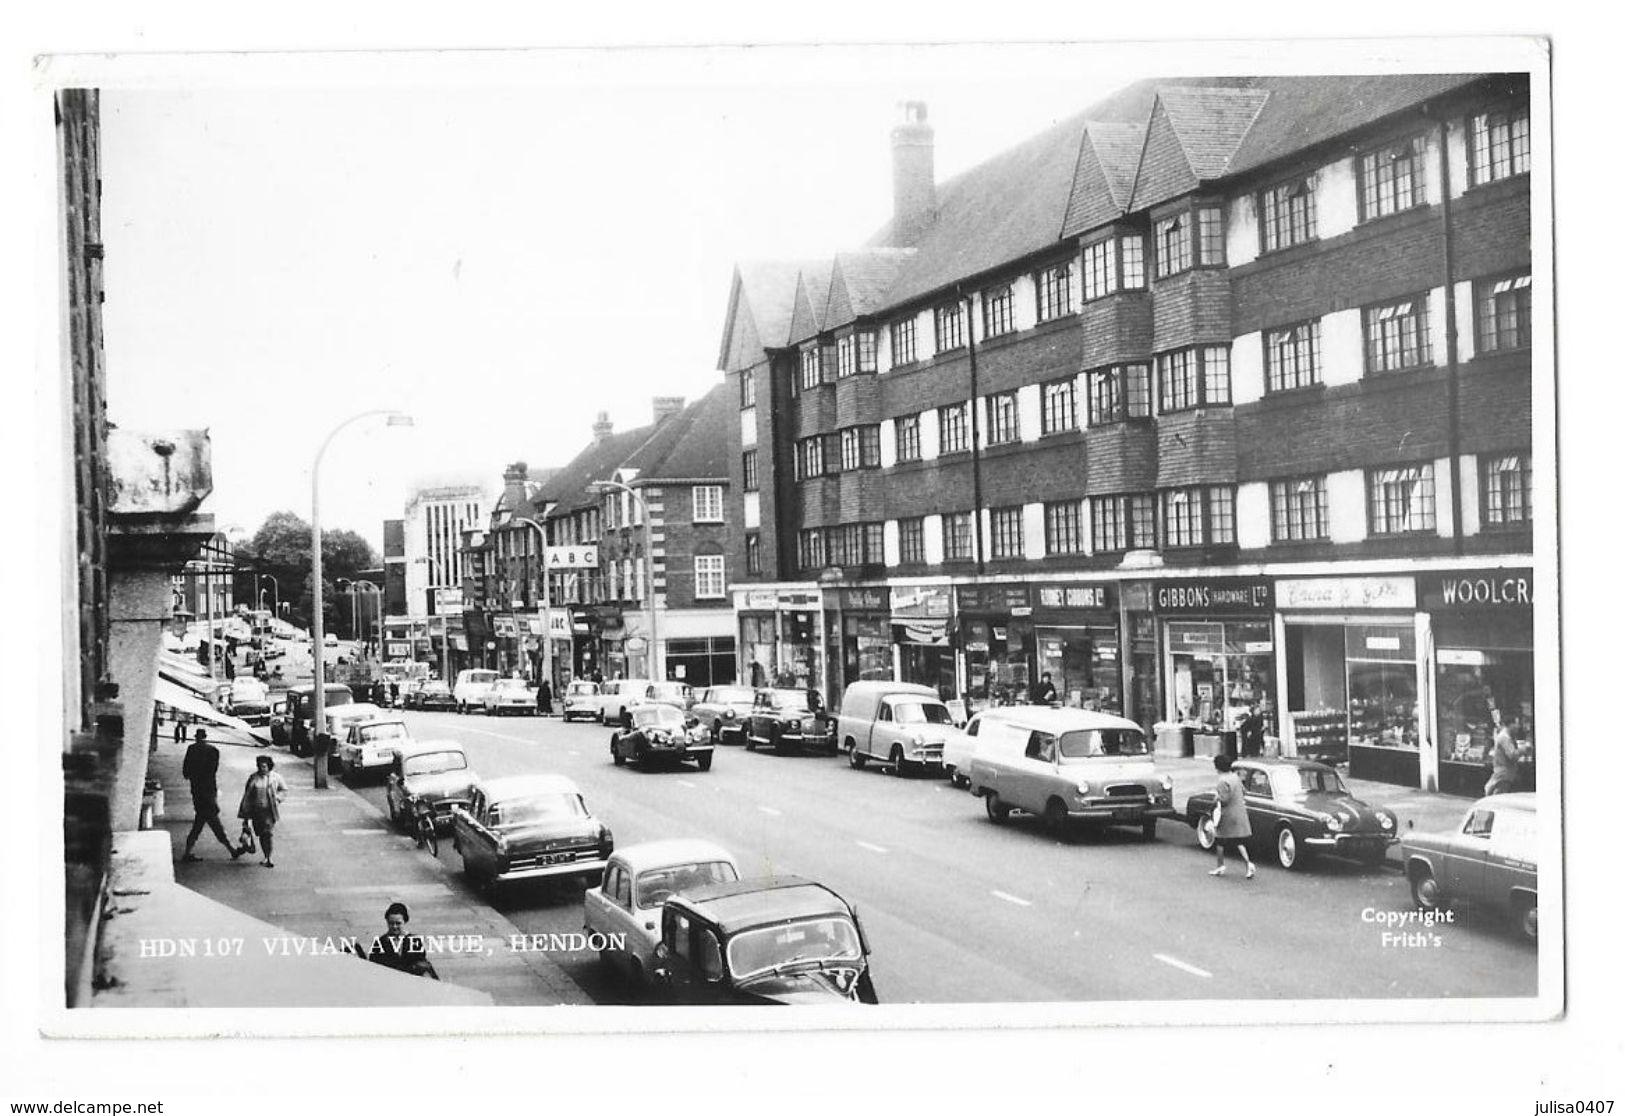 HENDON Vivian Avenue Automobiles - Middlesex